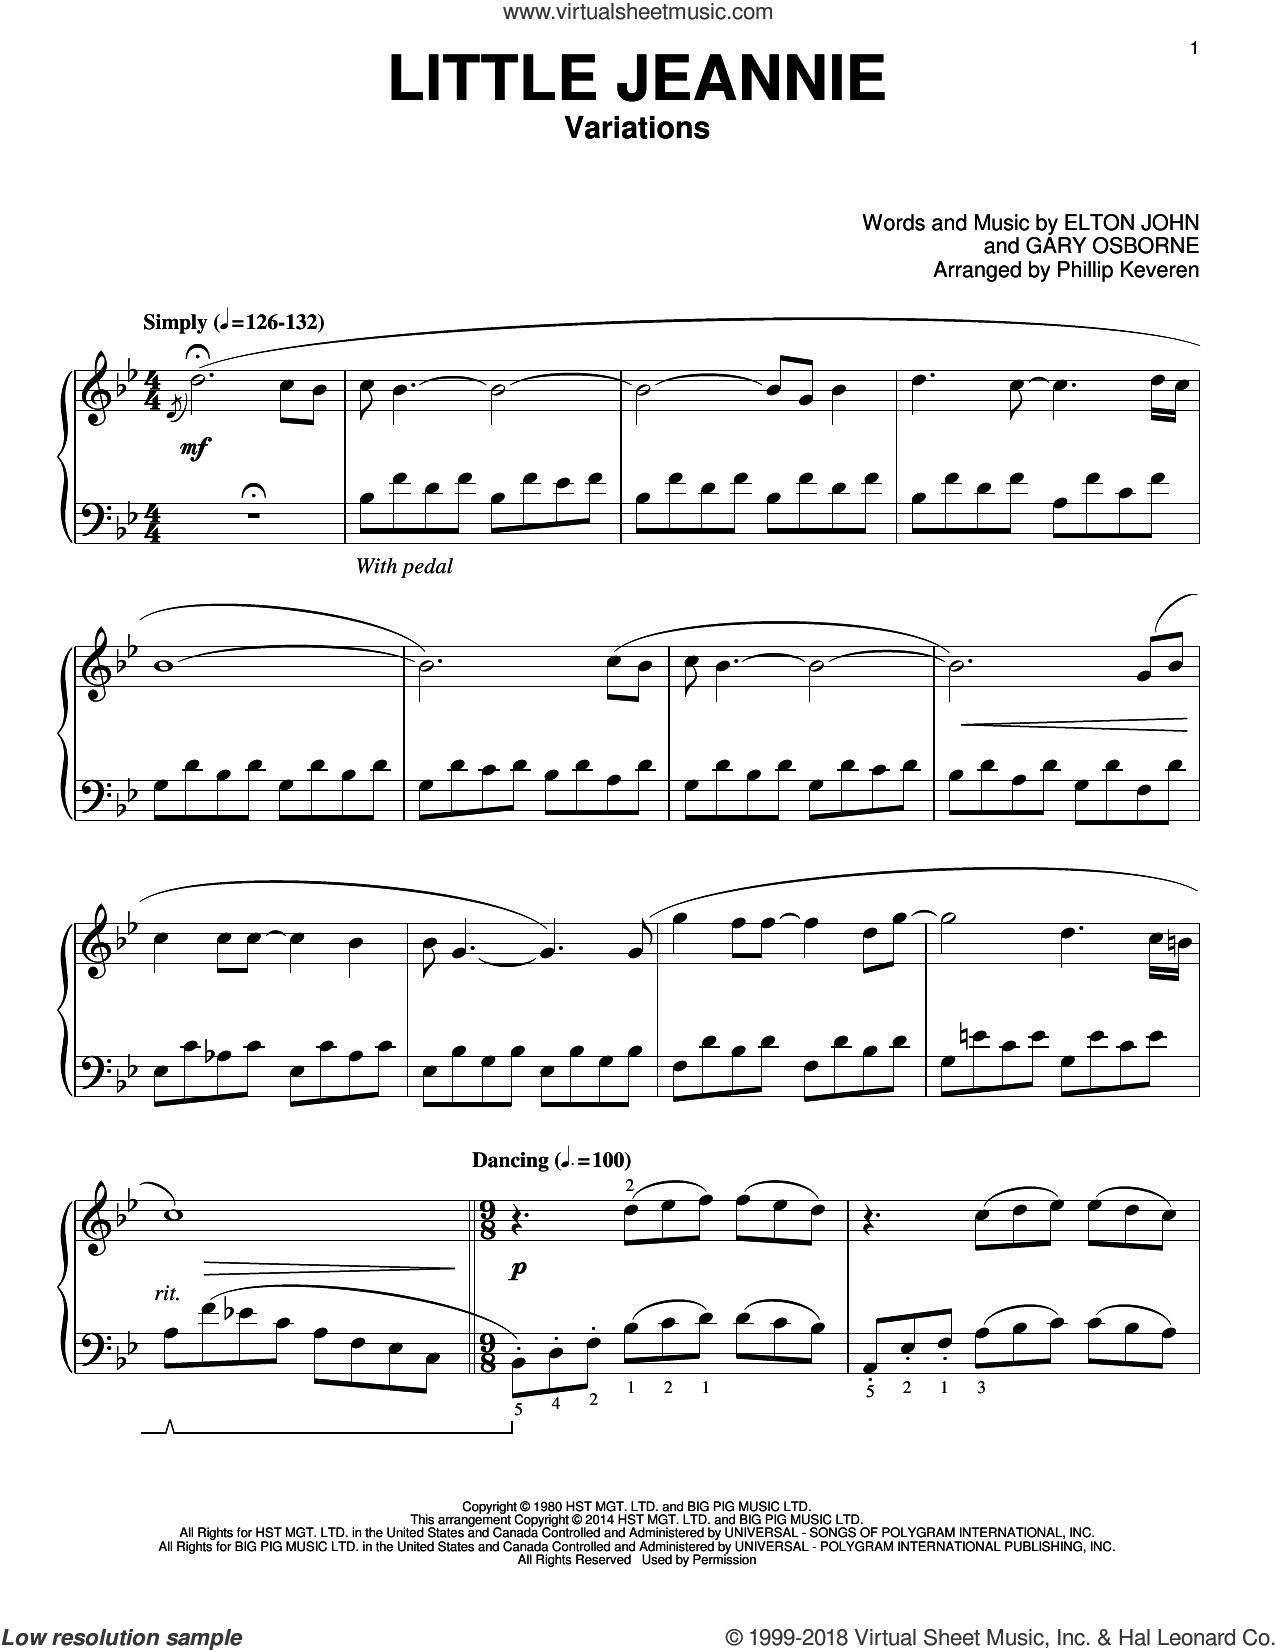 Little Jeannie sheet music for piano solo by Phillip Keveren, Elton John and Gary Osborne, intermediate skill level